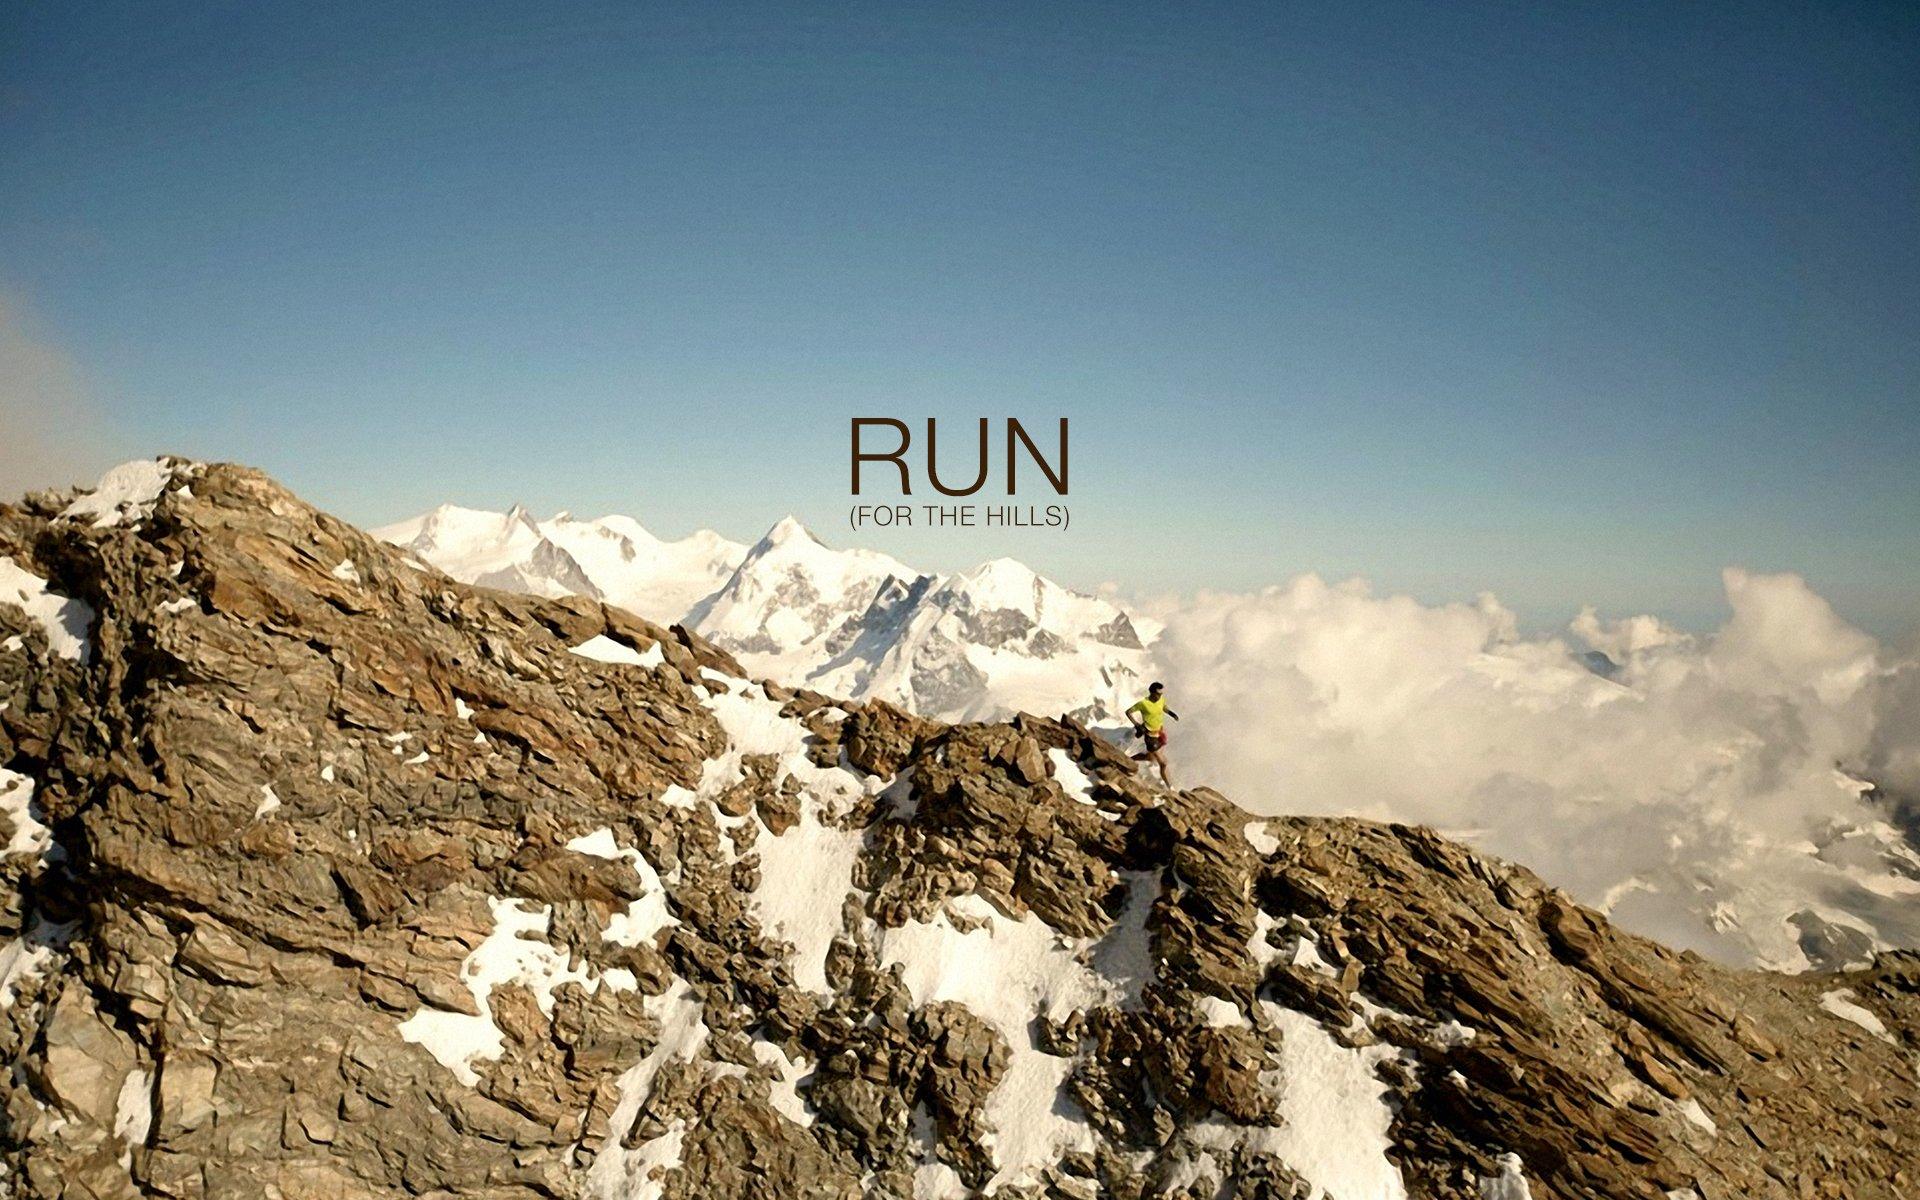 Run for the Hills Wallpaper 1920x1200